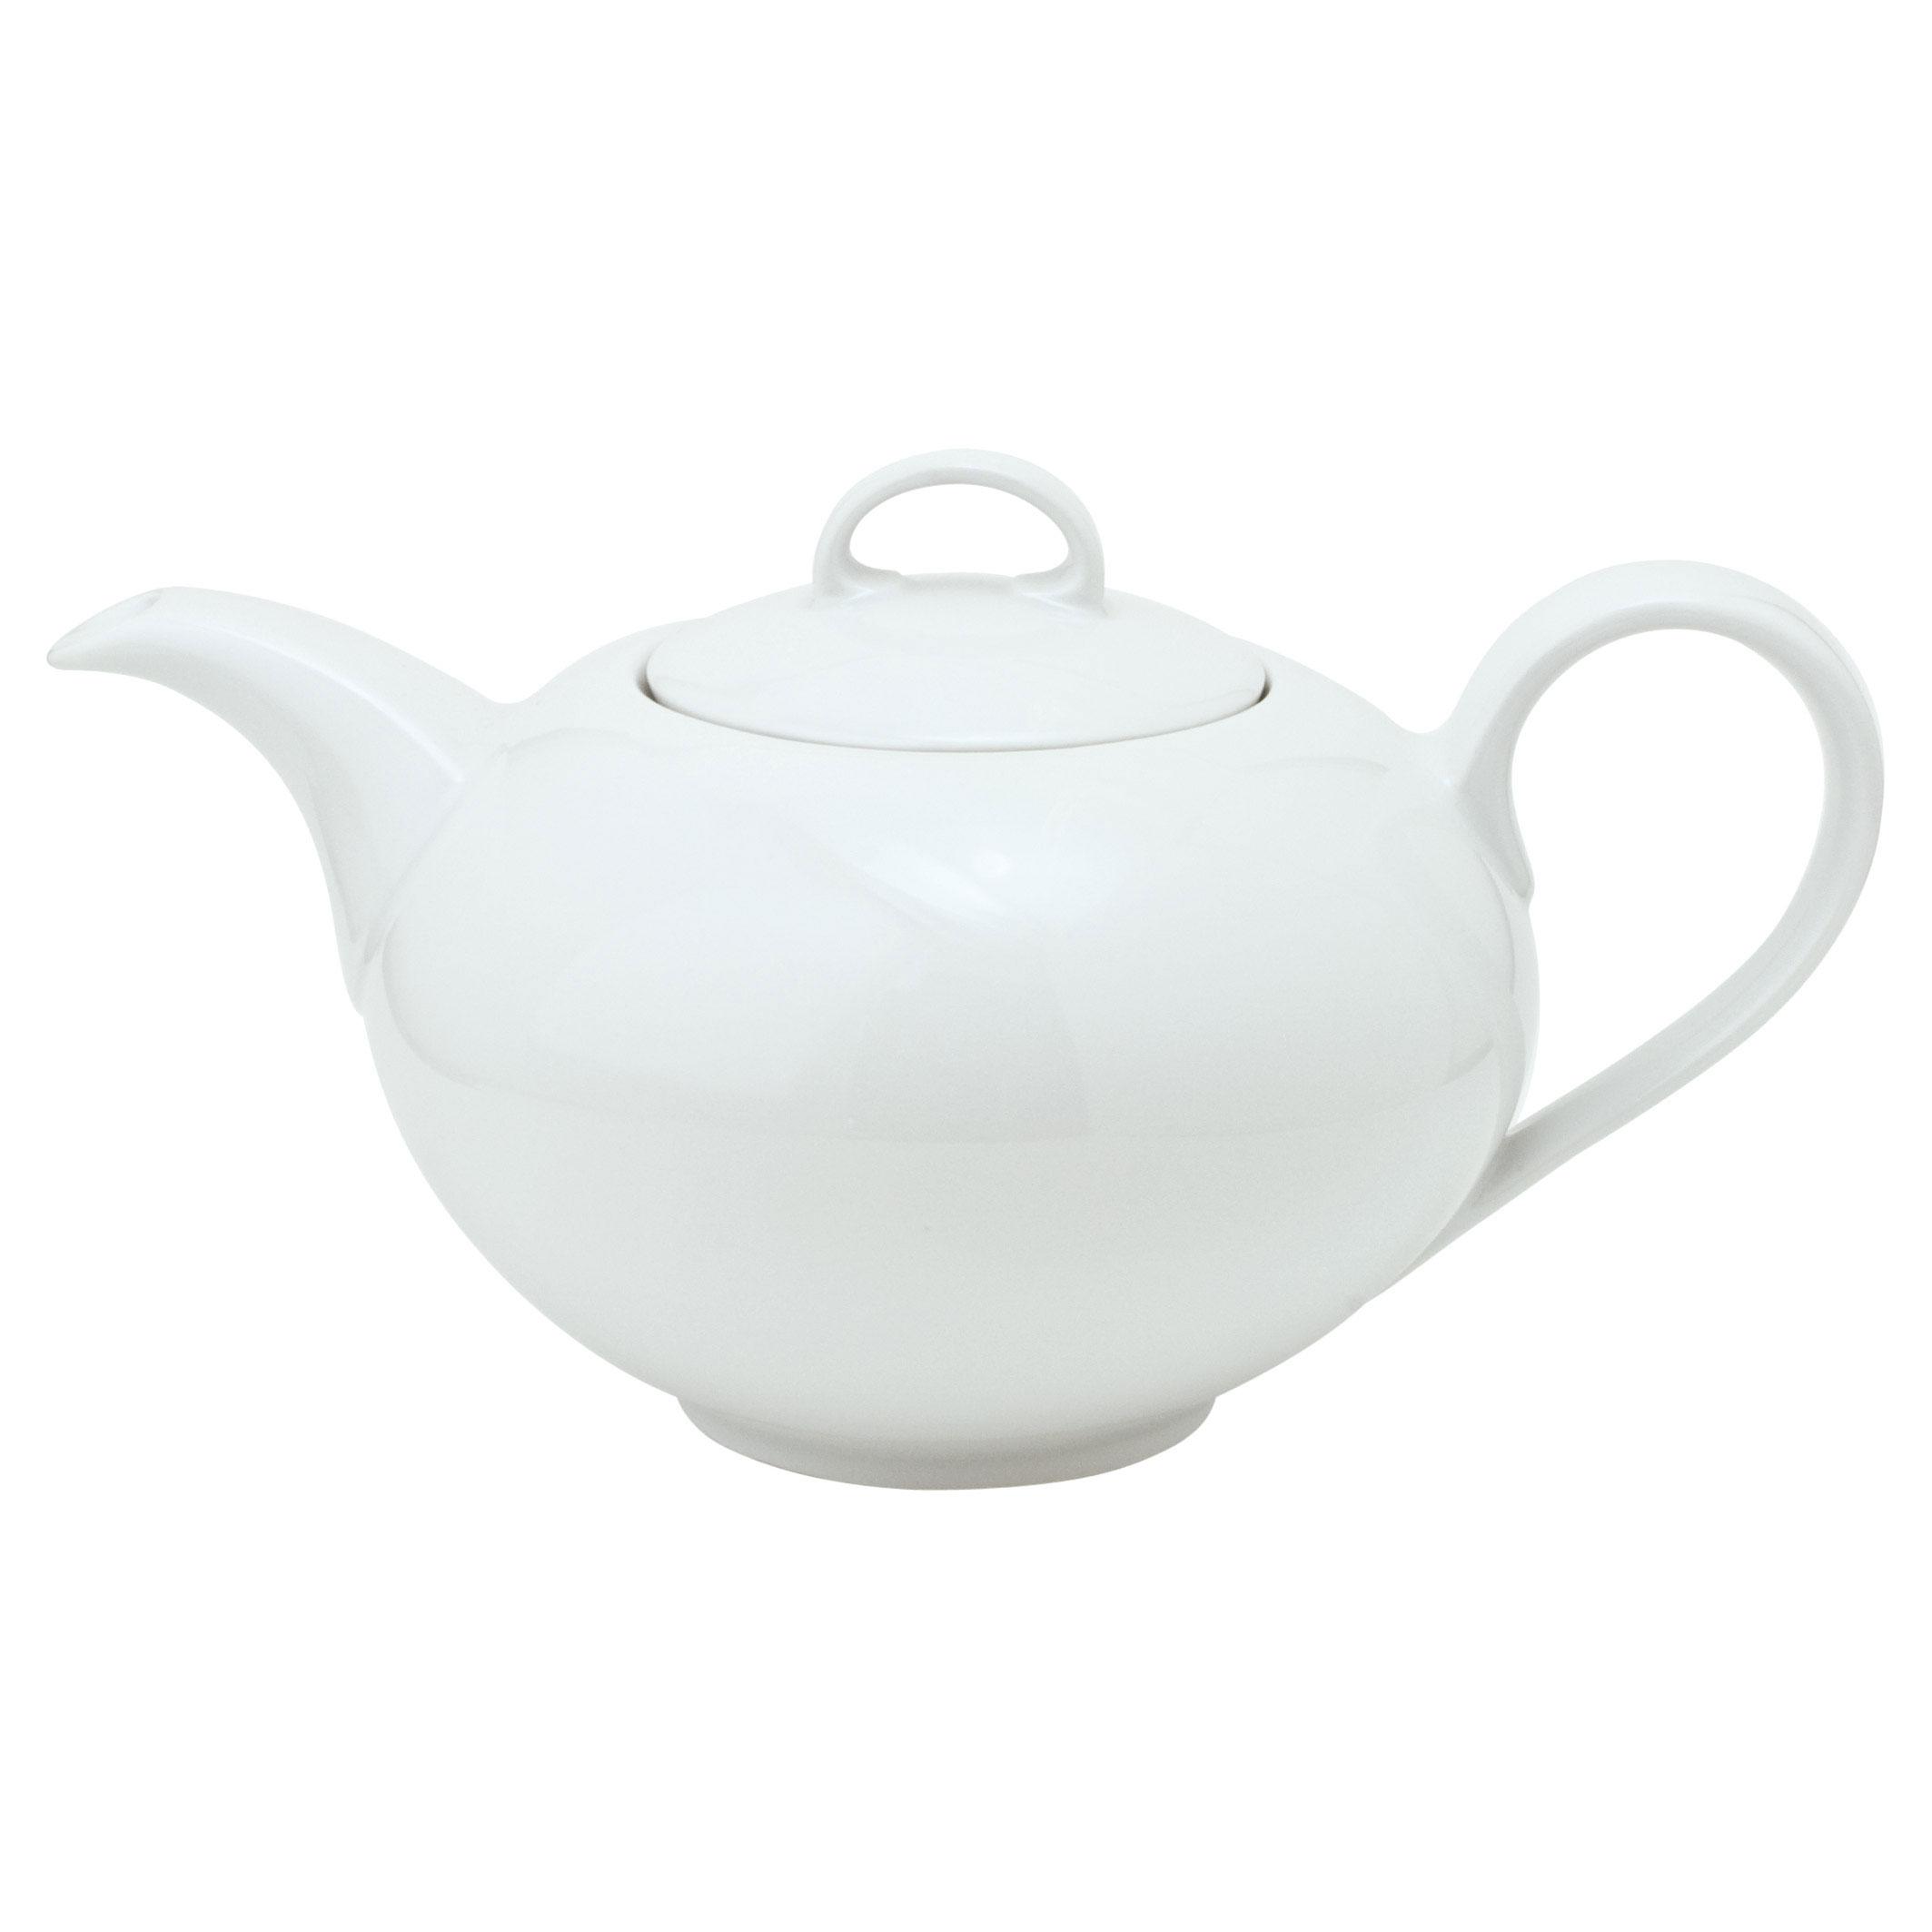 kahla aronda tea pot 1 1 l porcelain white 051402a90005b at about shop. Black Bedroom Furniture Sets. Home Design Ideas